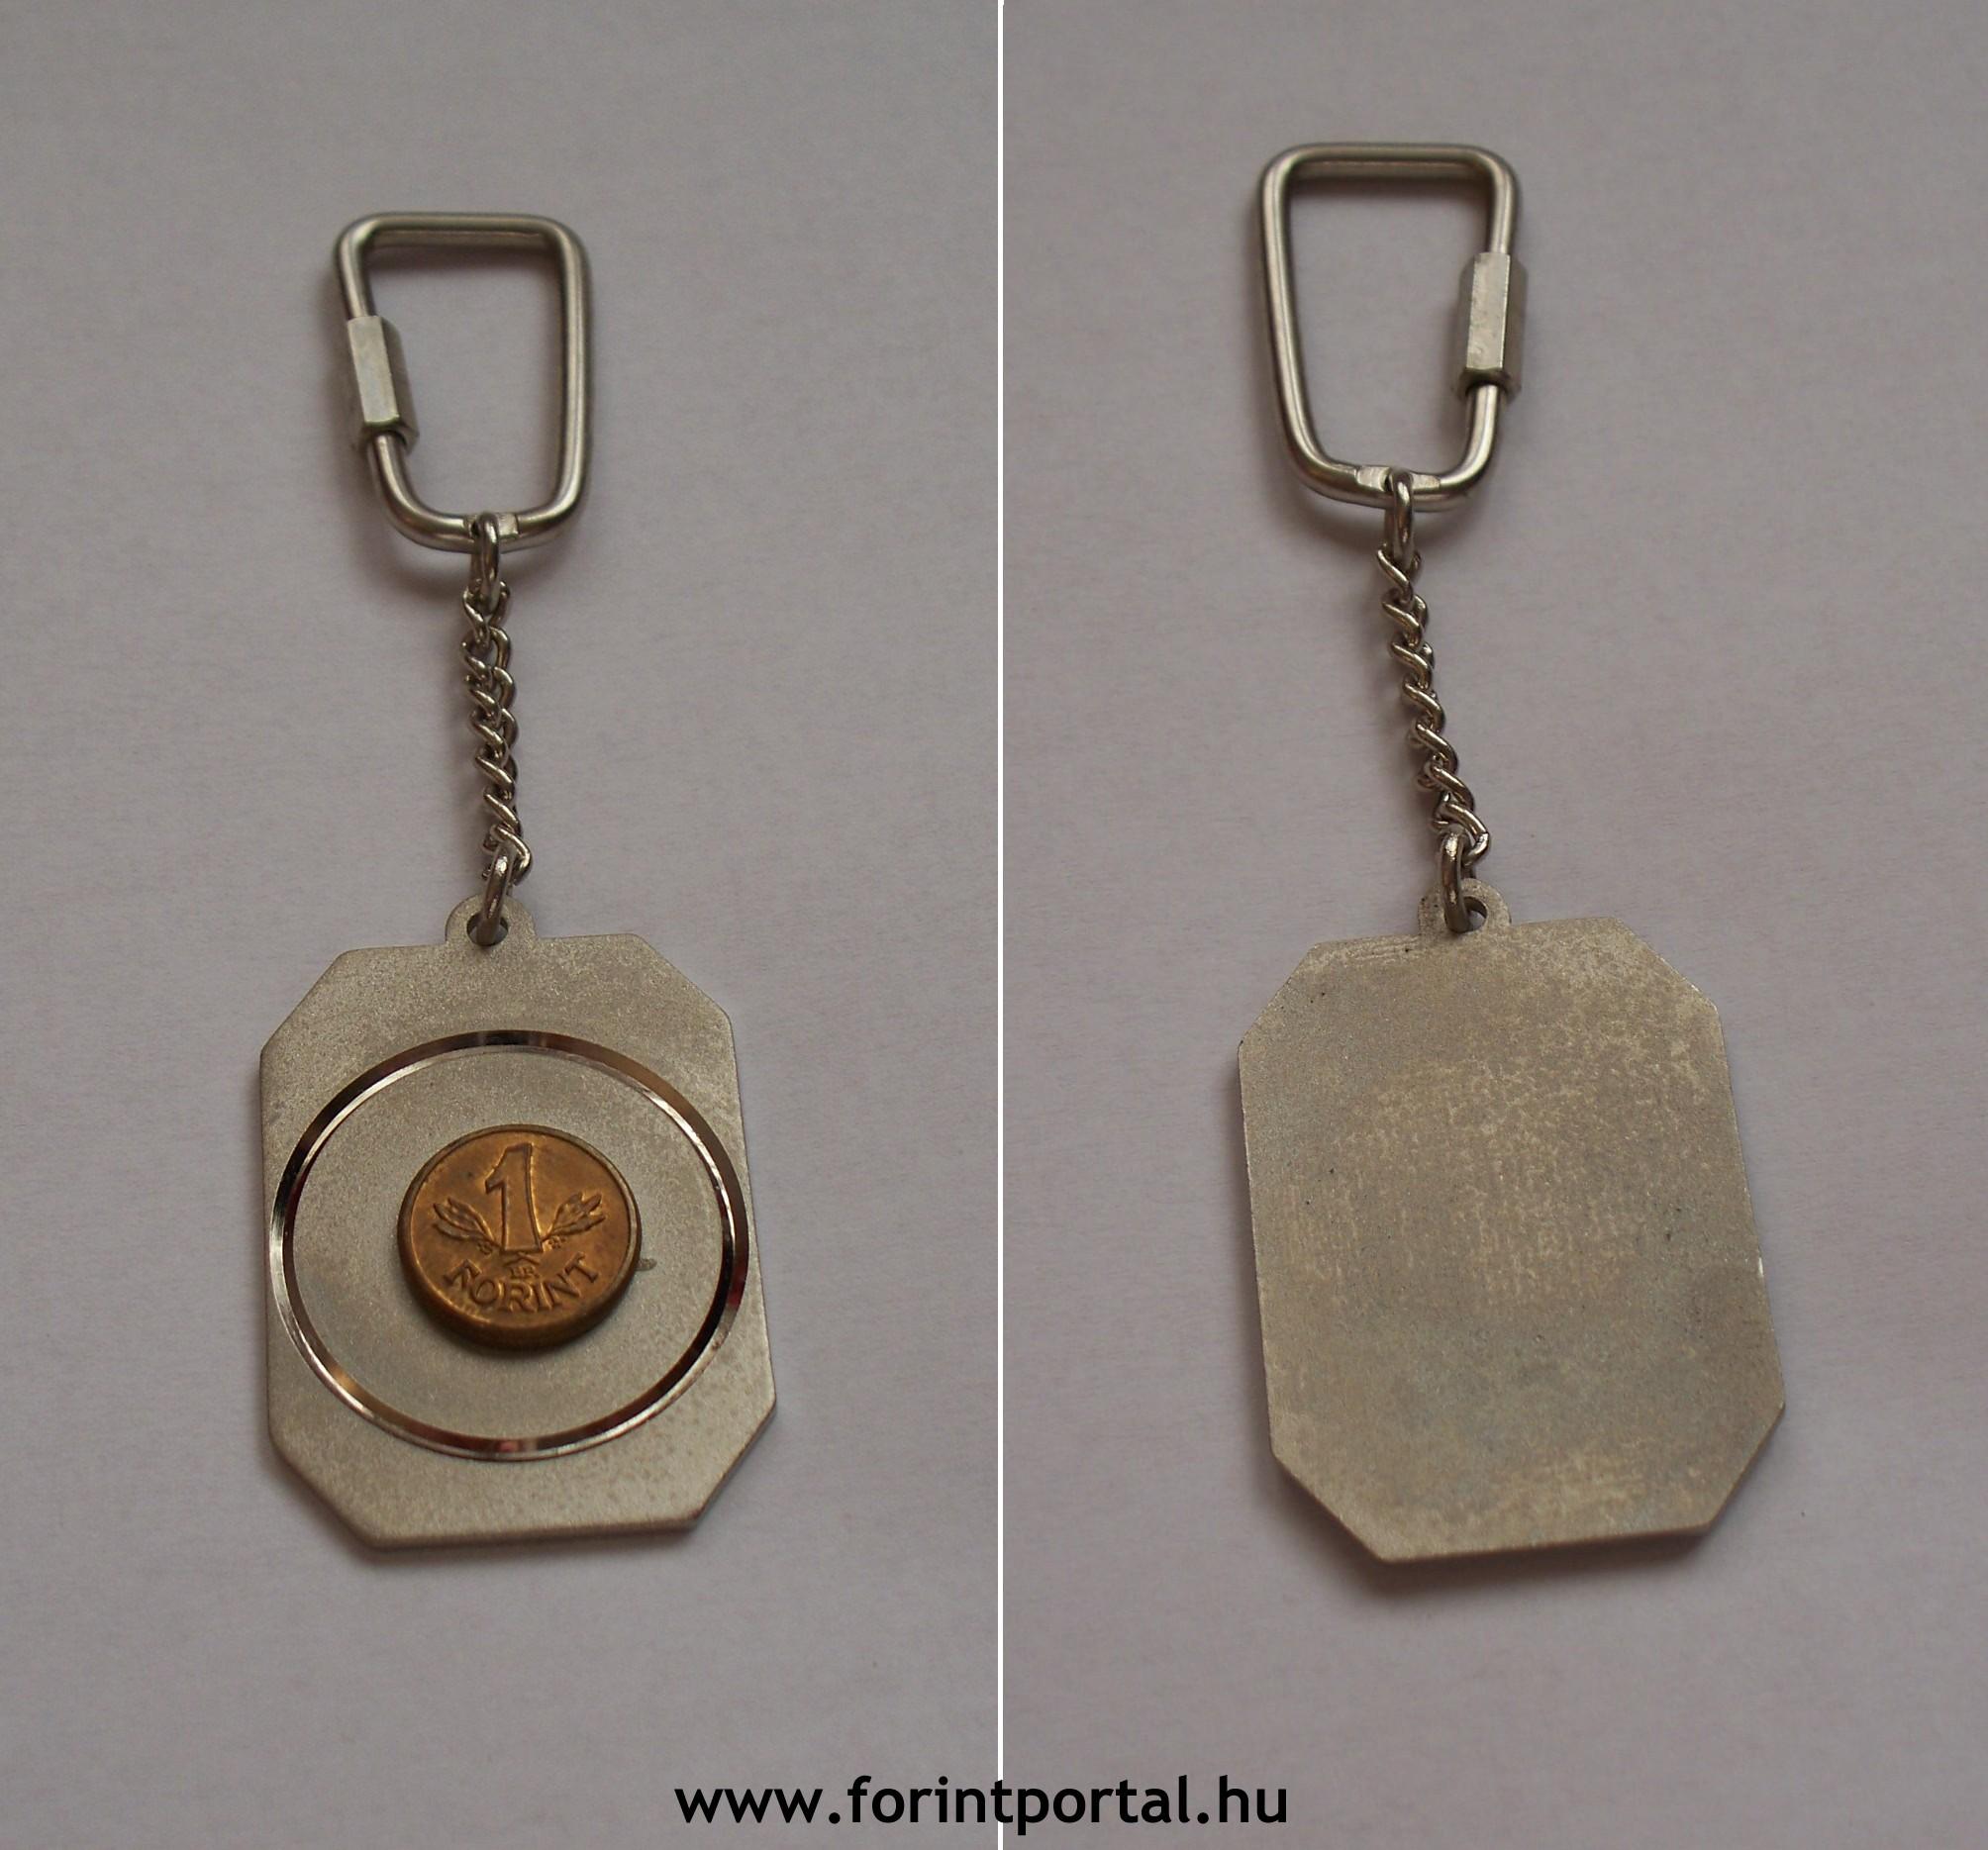 http://www.forintportal.hu/hirek/mini-1-forintos-kulcstartok/mini-1-forintos-kulcstartok-apv-allami-penzvero-vorosrez-1ft.jpg